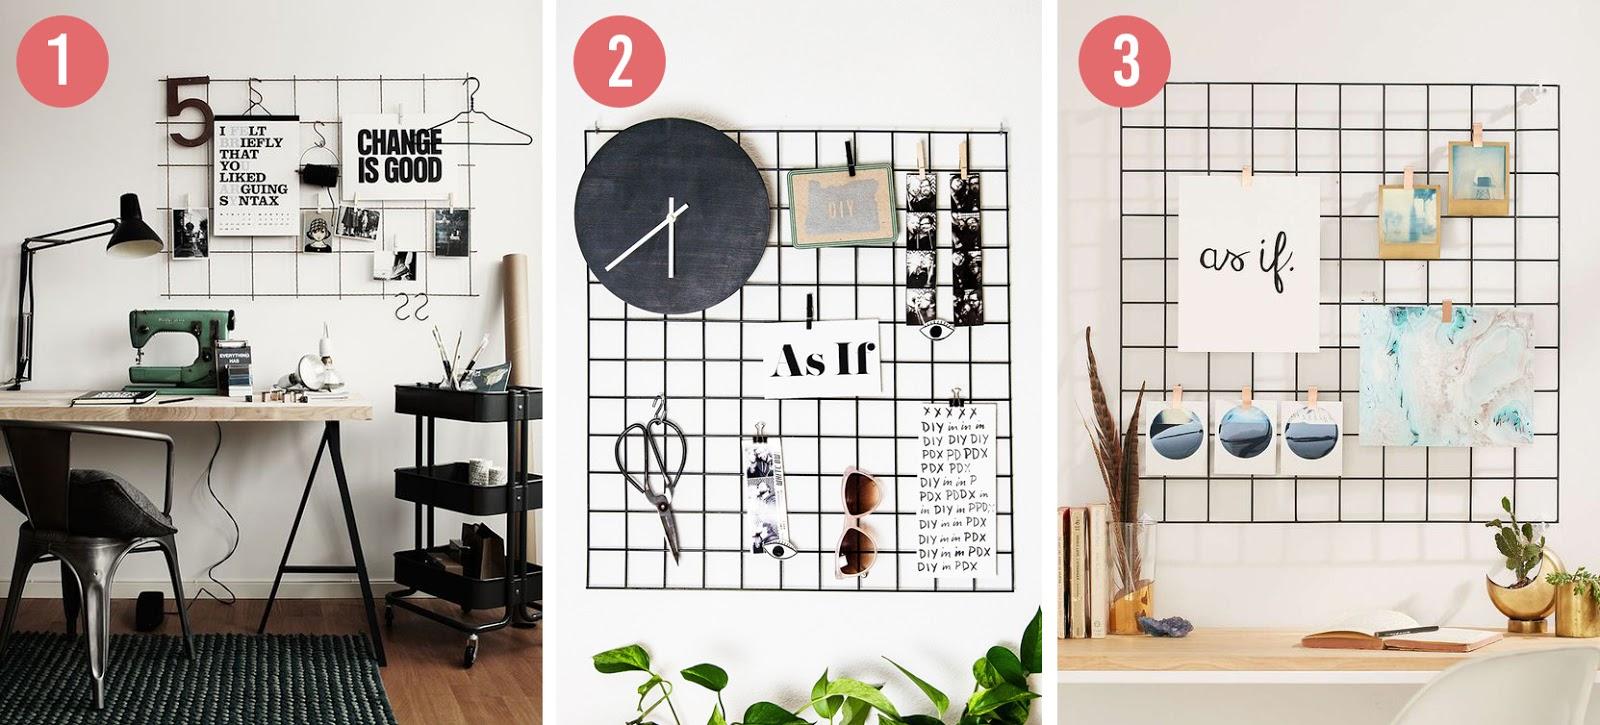 Diy wandrek wall grid the budget life low budget lifestyle tips - Wandrek ijzeren ...